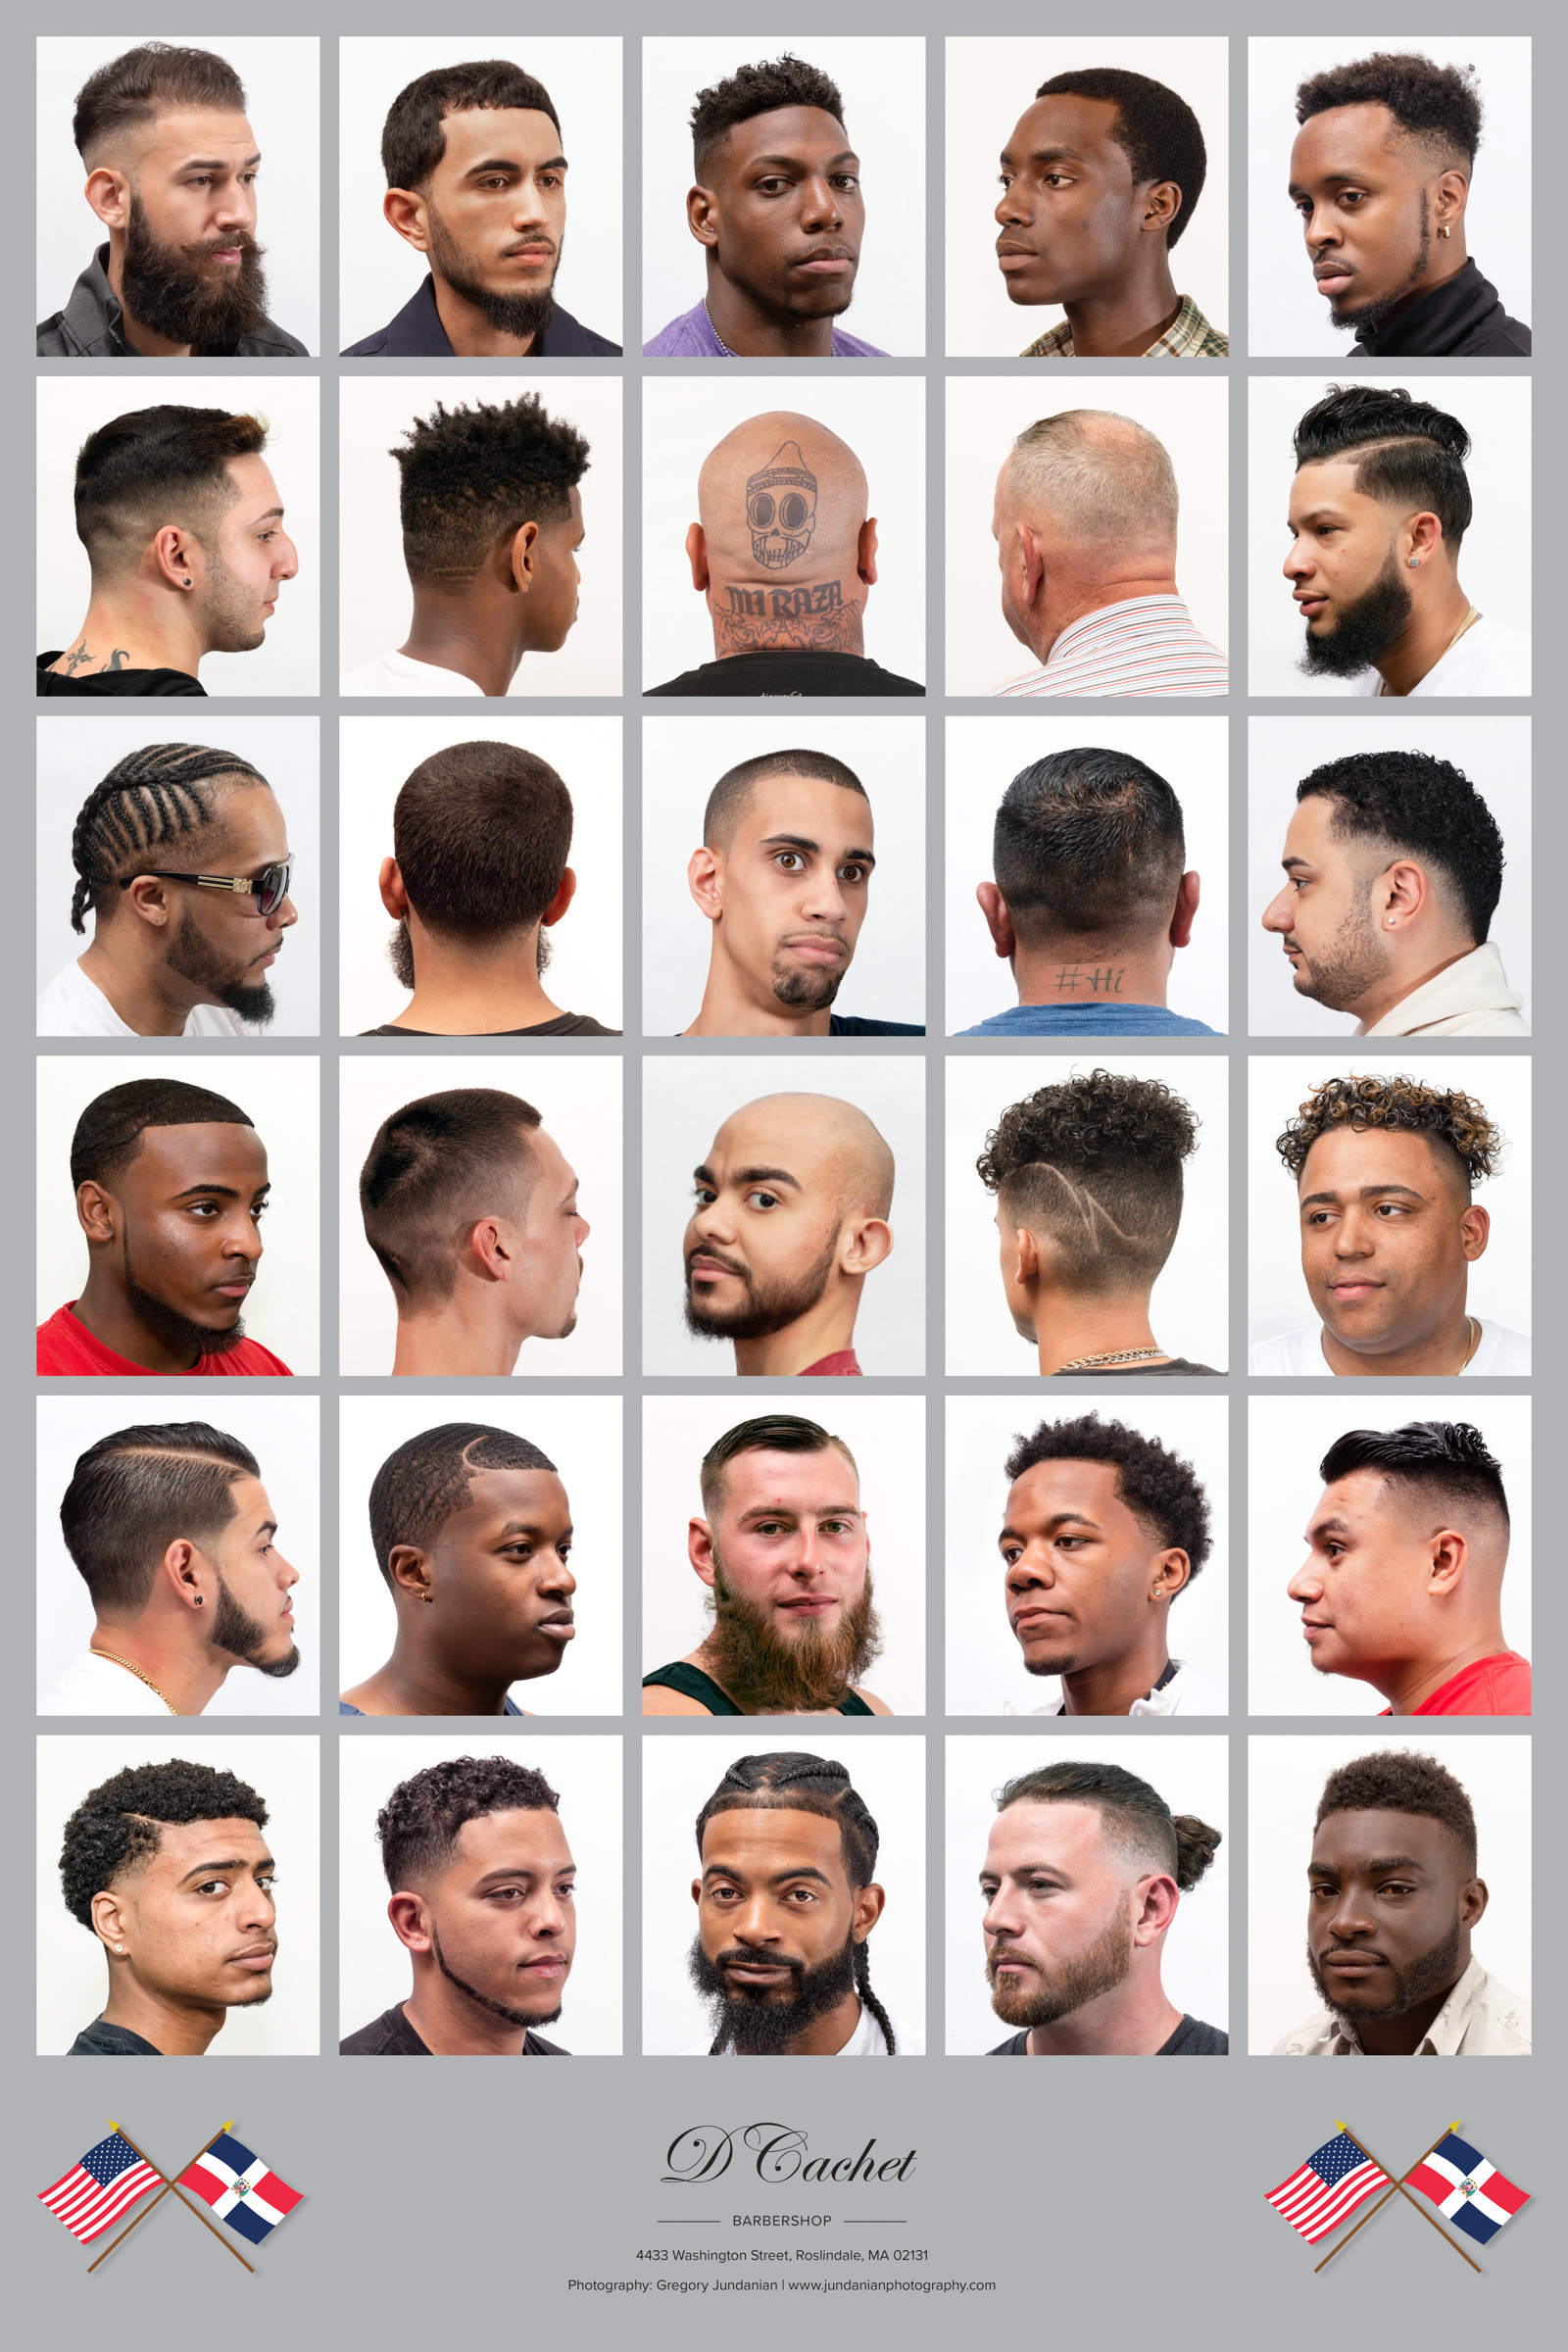 D'Cachet Barbershop, Roslindale, MA